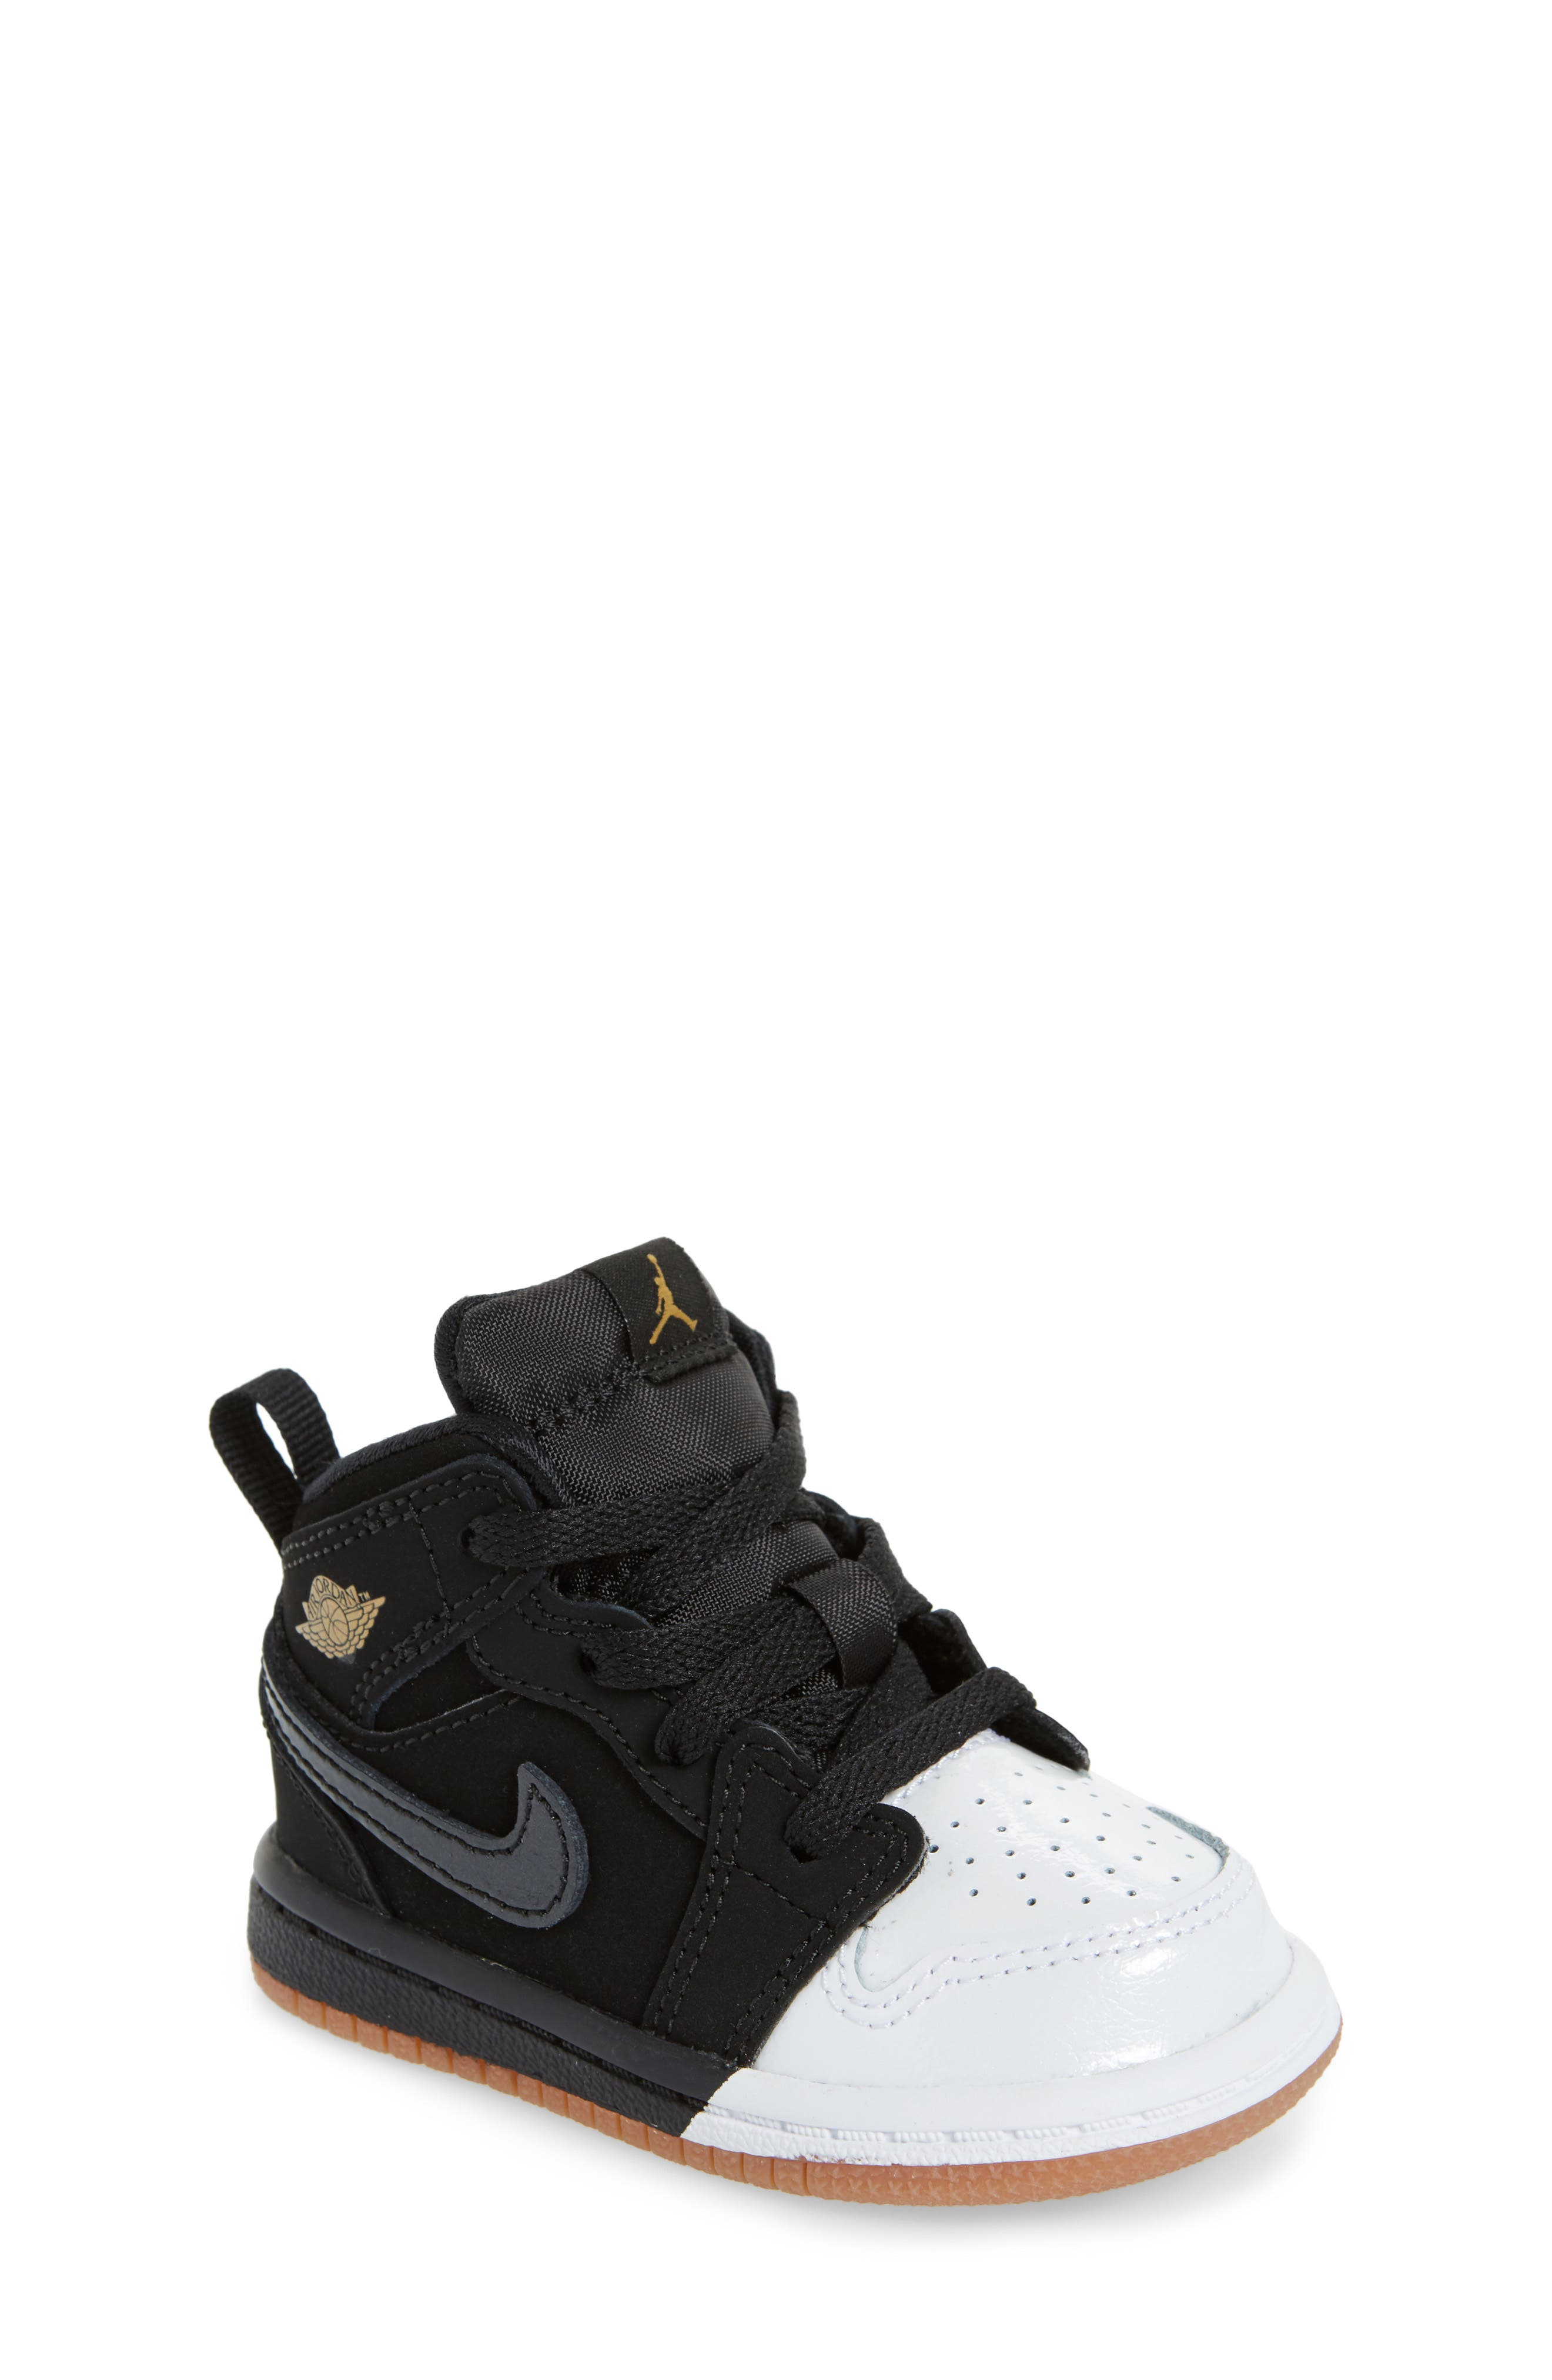 Alternate Image 1 Selected - Nike 'Jordan 1 Mid' Basketball Shoe (Walker)